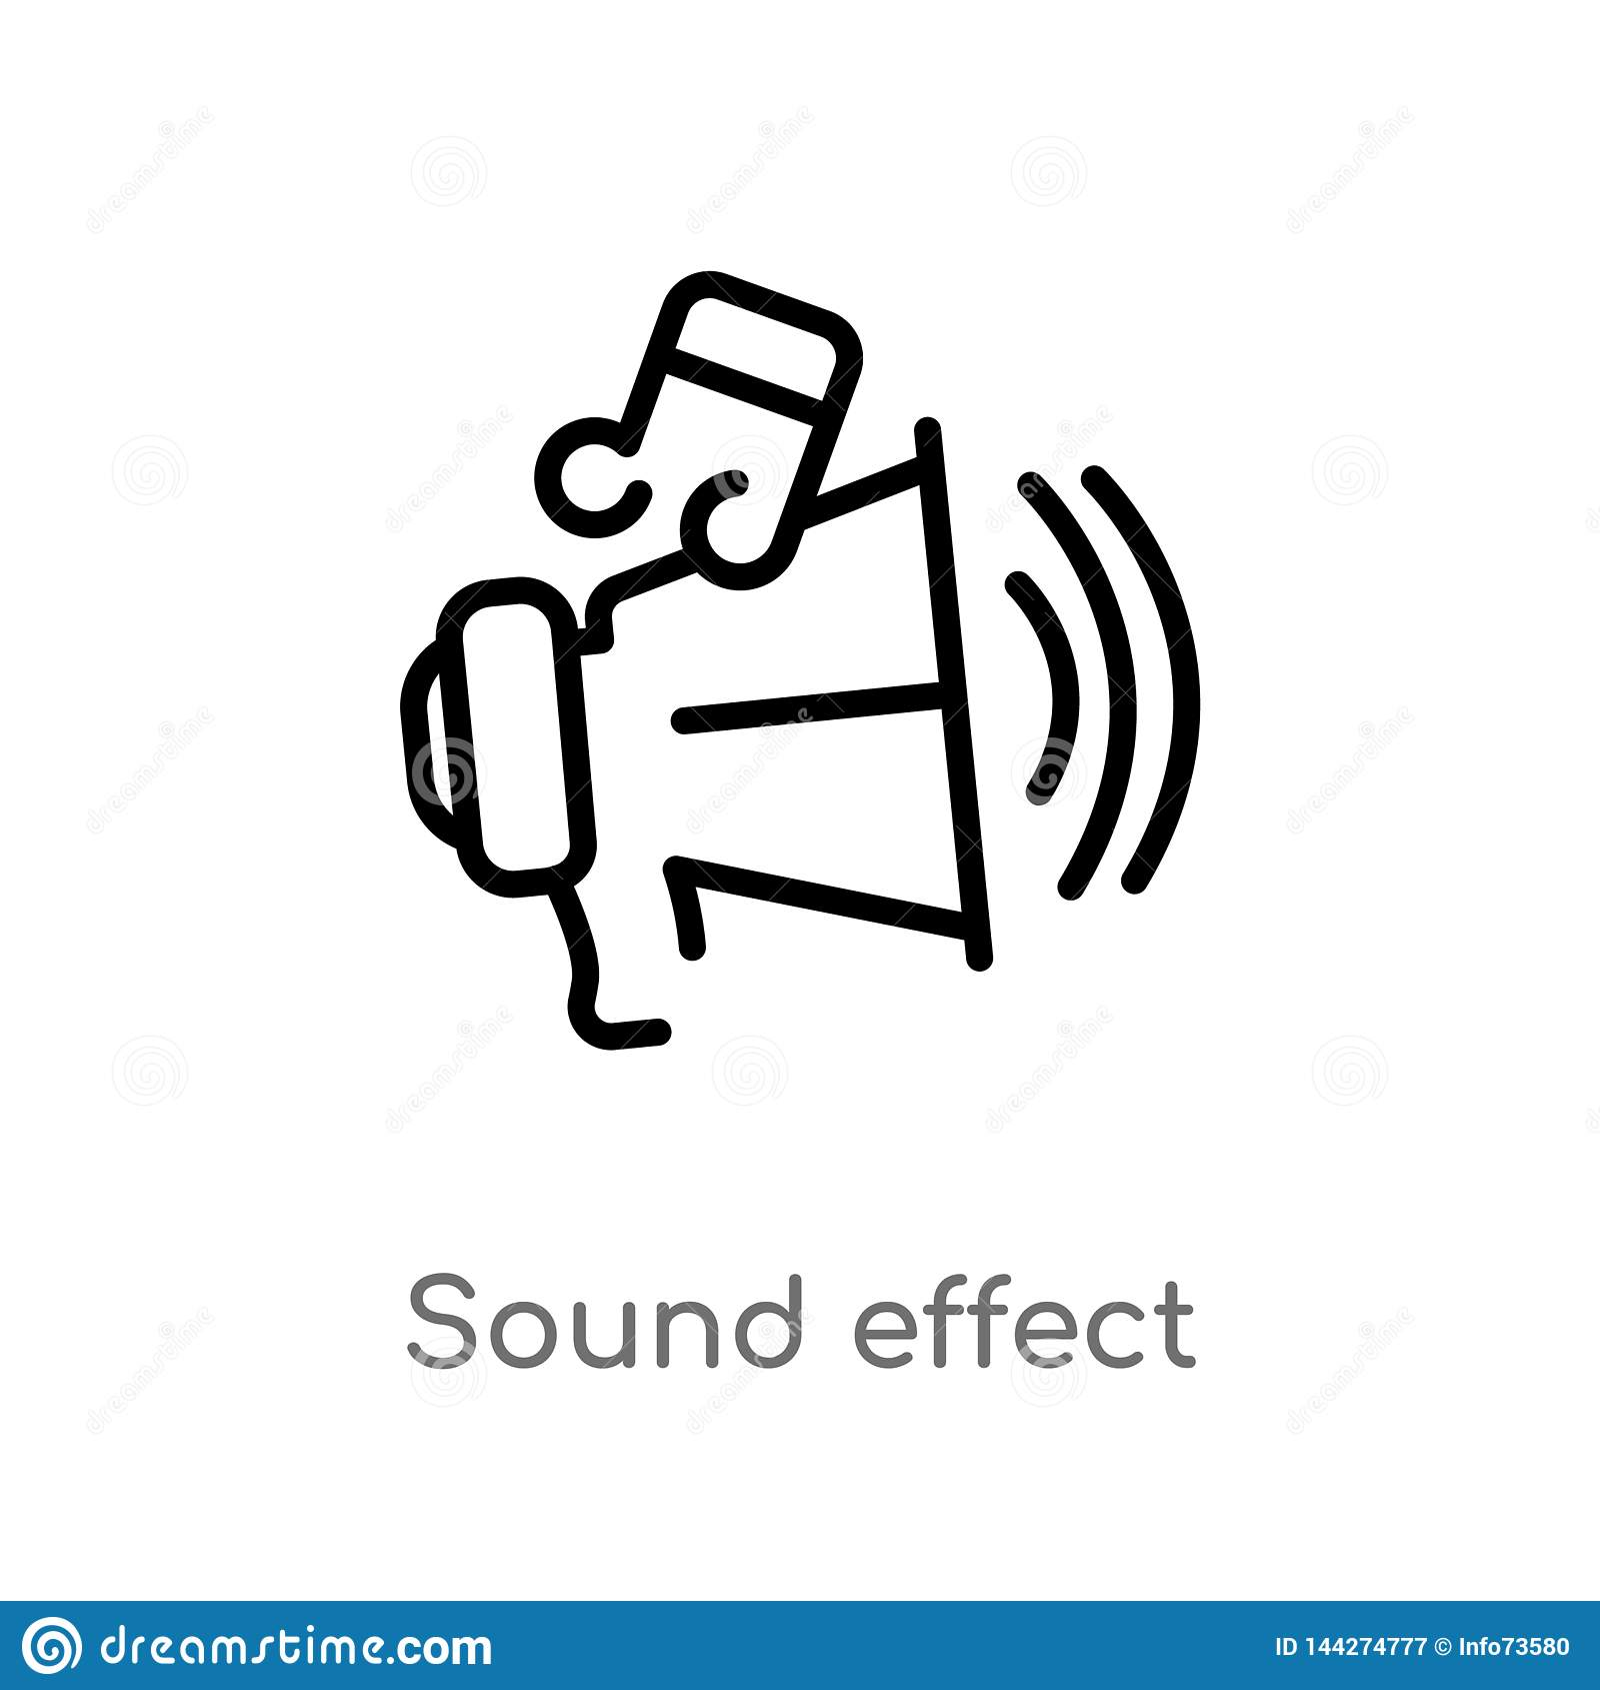 Icono del vector del efecto sonoro del esquema l?nea simple negra aislada ejemplo del elemento del concepto del cine Movimiento E